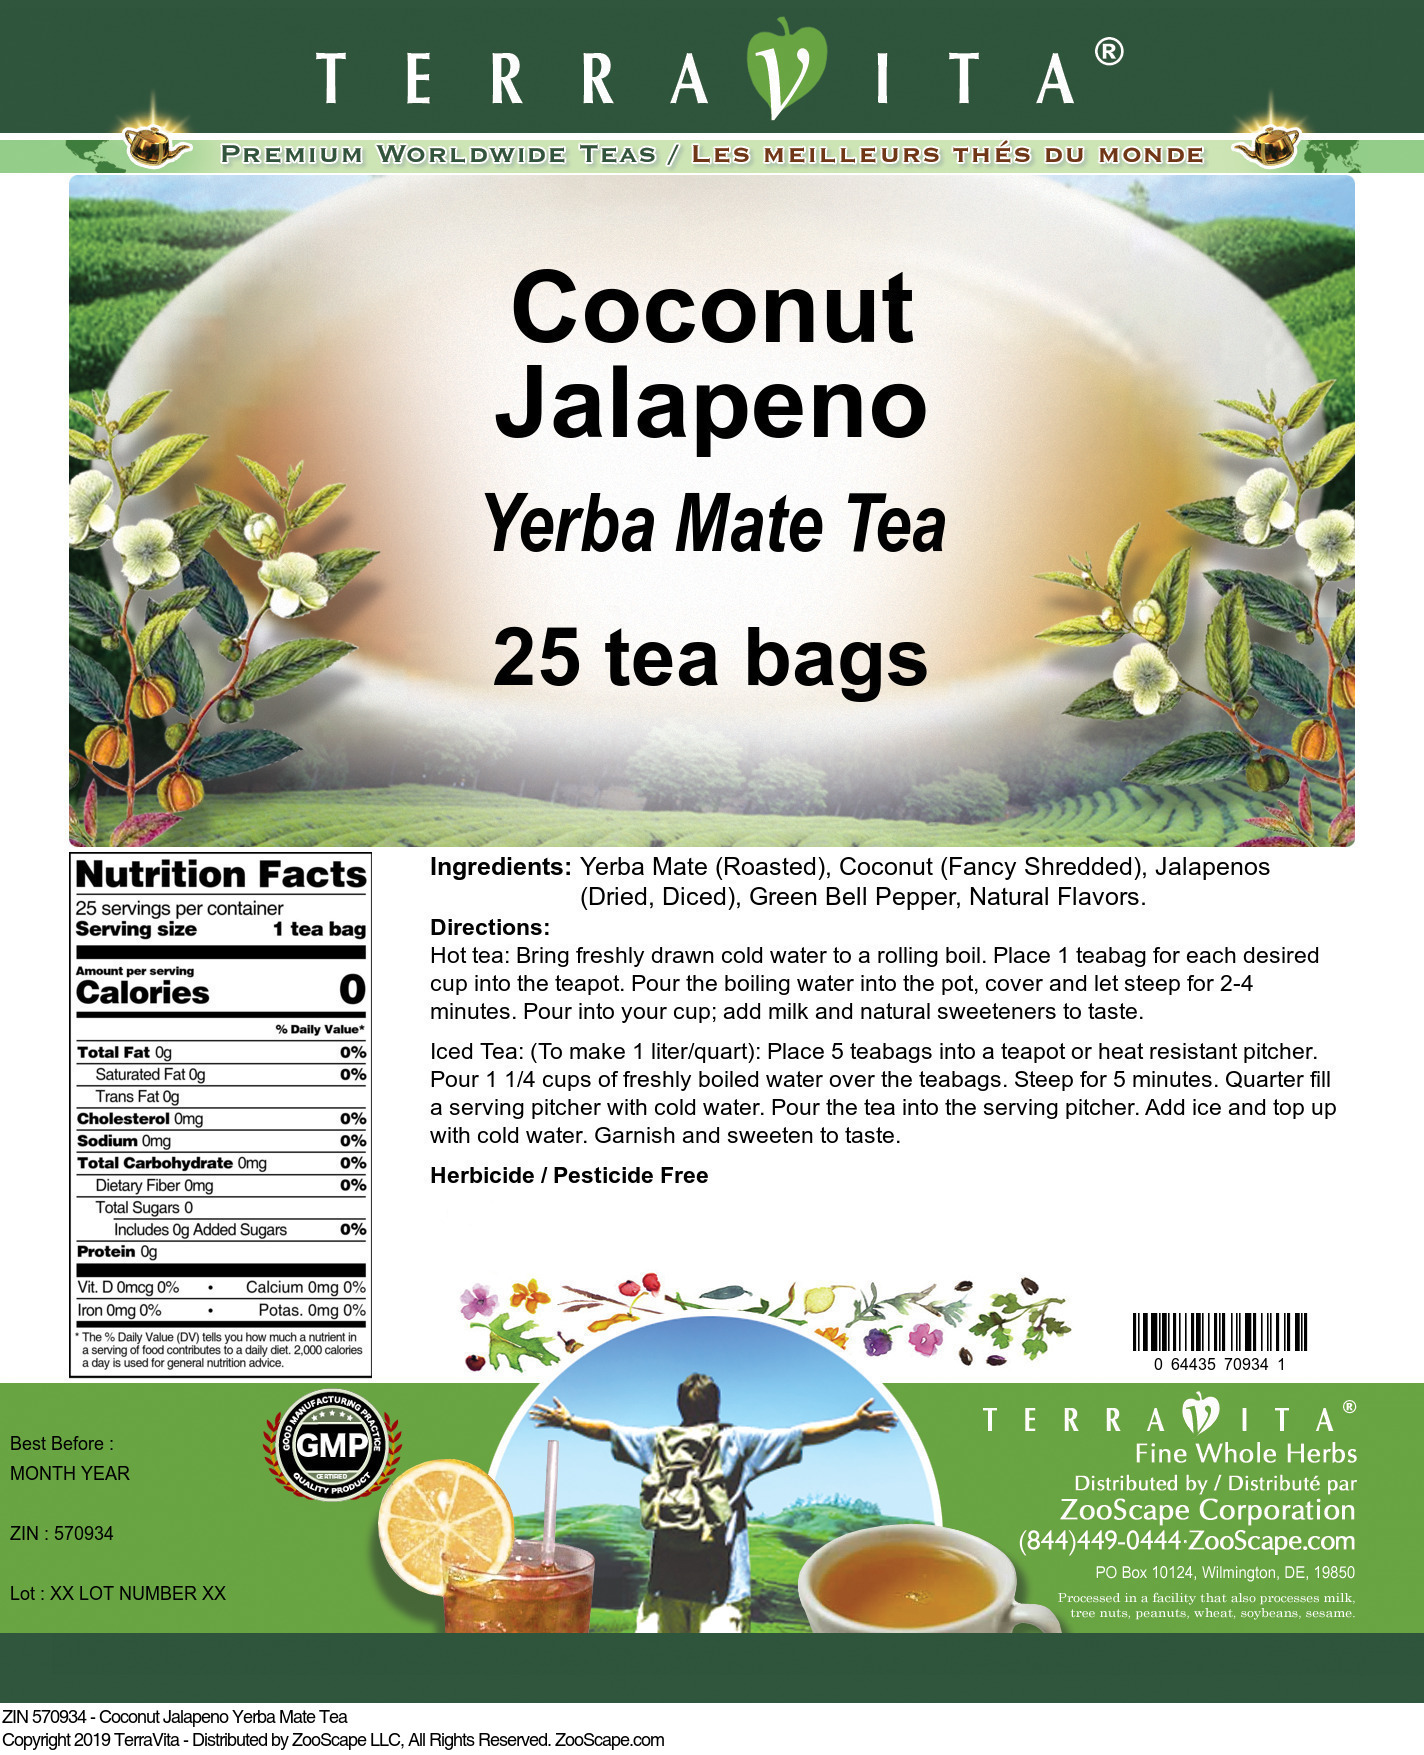 Coconut Jalapeno Yerba Mate